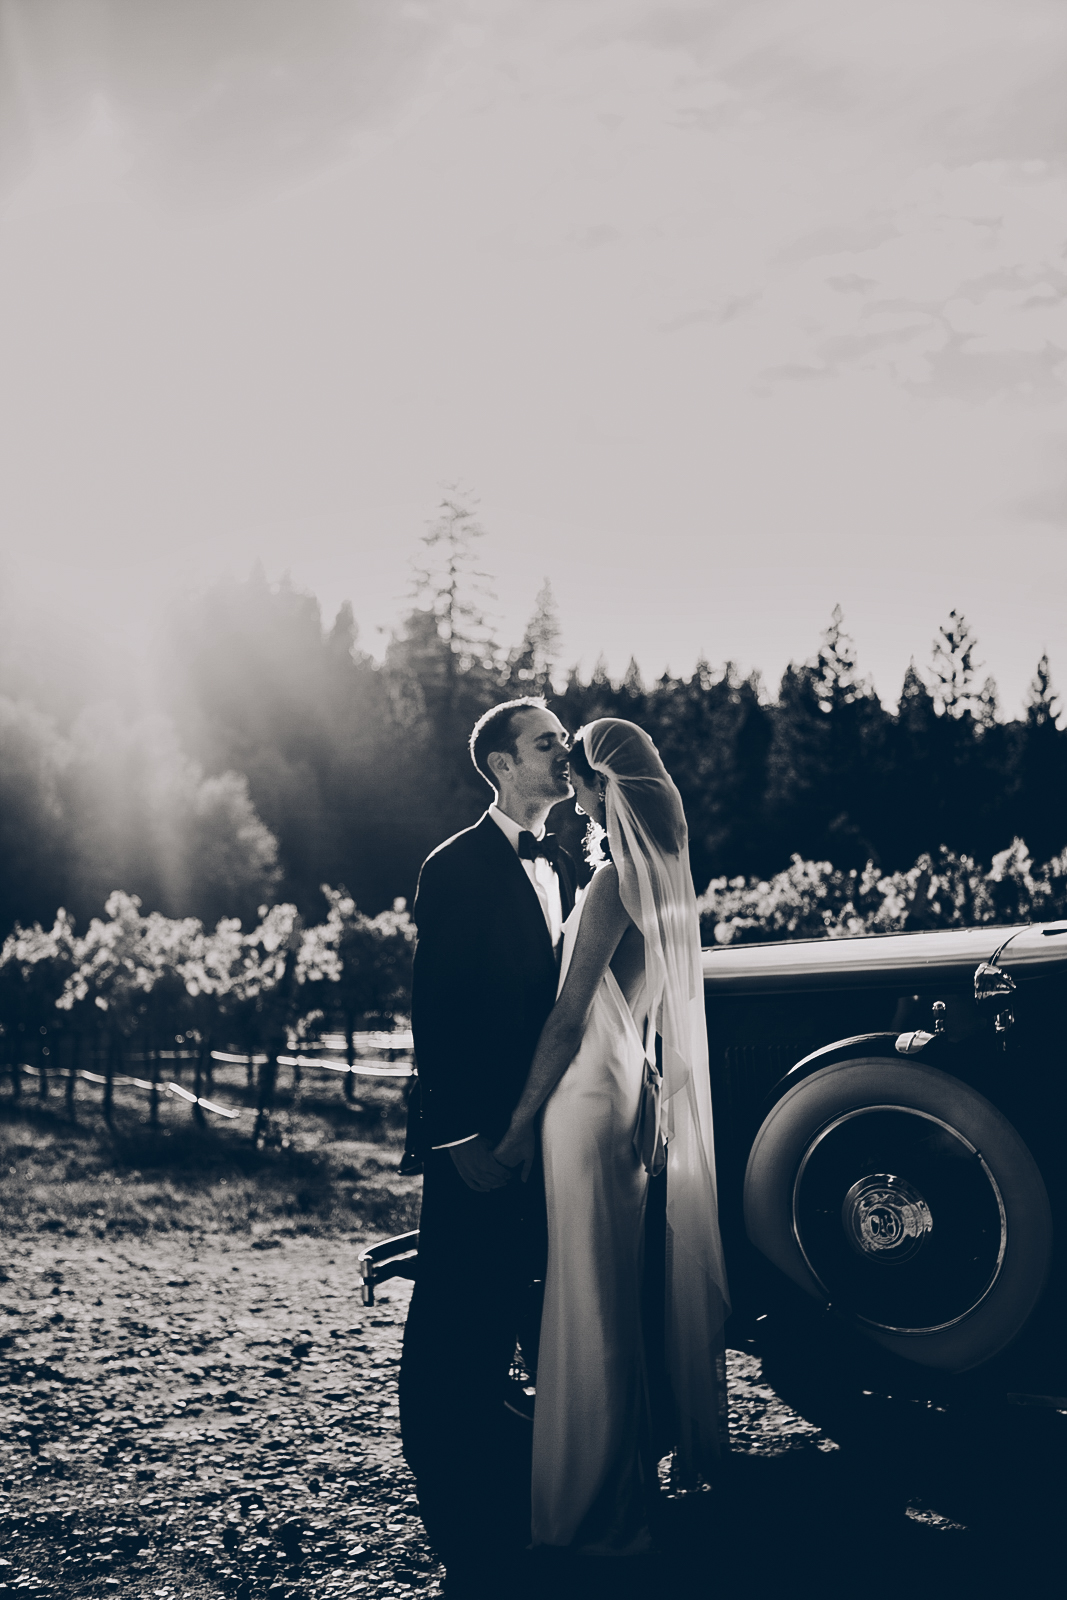 miraflores_winery_wedding_photography_ian_melissa_ebony_siovhan_bokeh_photography_47.jpg